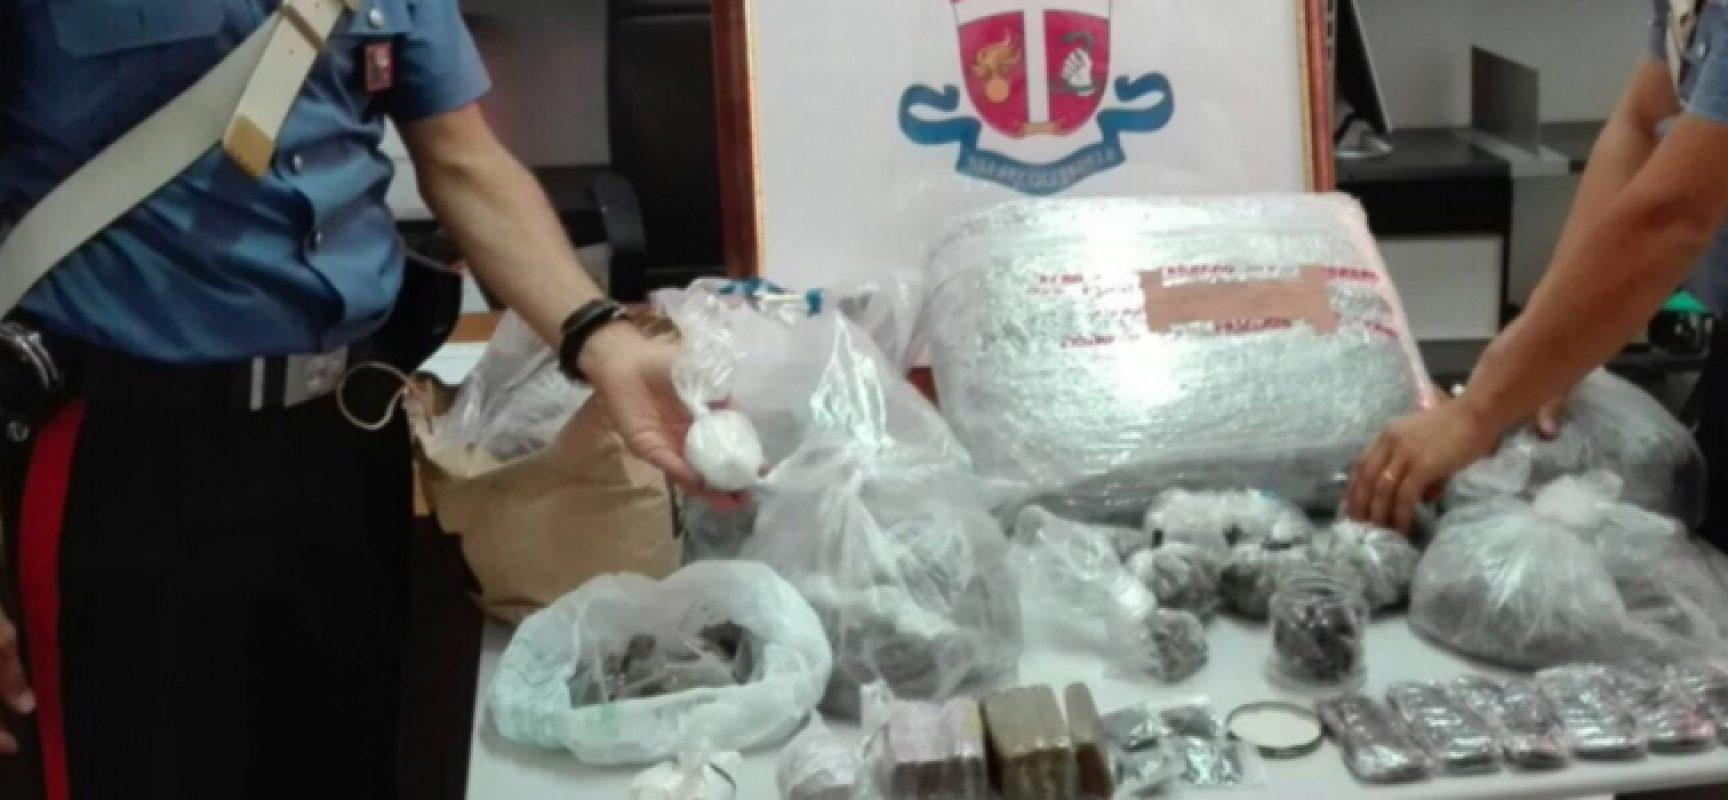 Droga e furto di energia elettrica, due arresti a Bisceglie